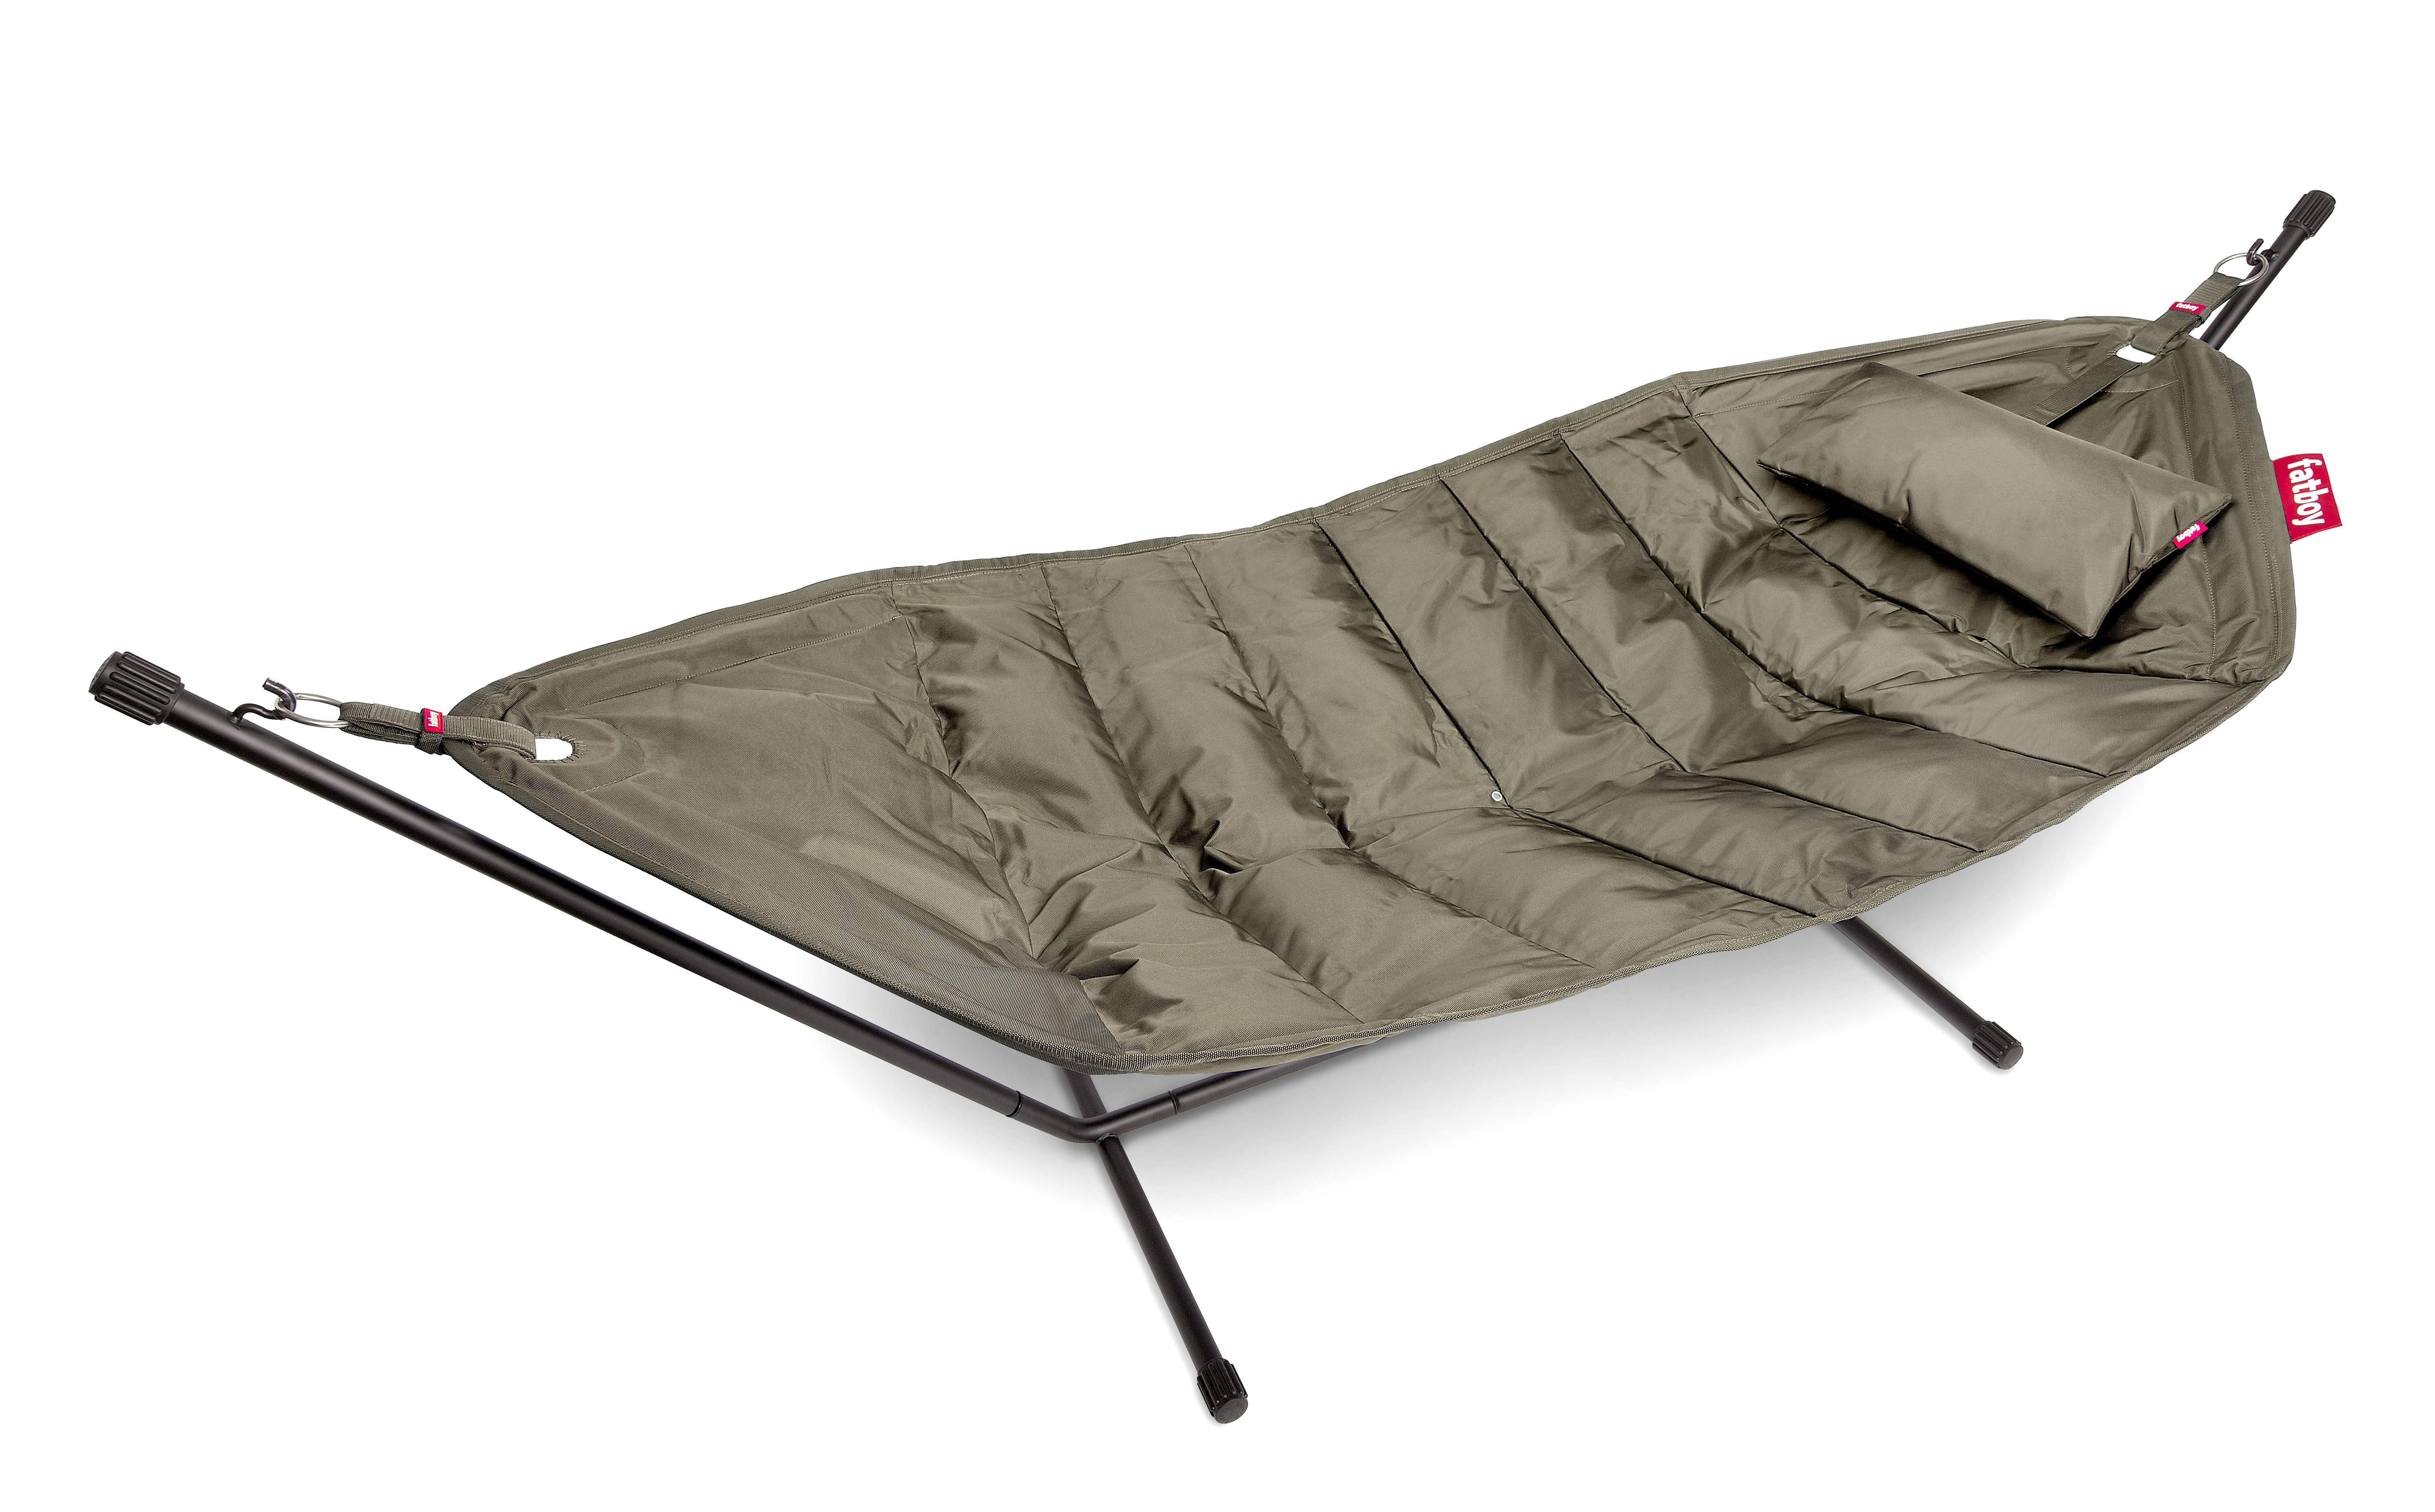 Outdoor - Chaises longues et hamacs - Hamac Headdemock Deluxe / Tissu polyester - Avec coussin & housse - Fatboy - Taupe - Acier laqué époxy, Polyester